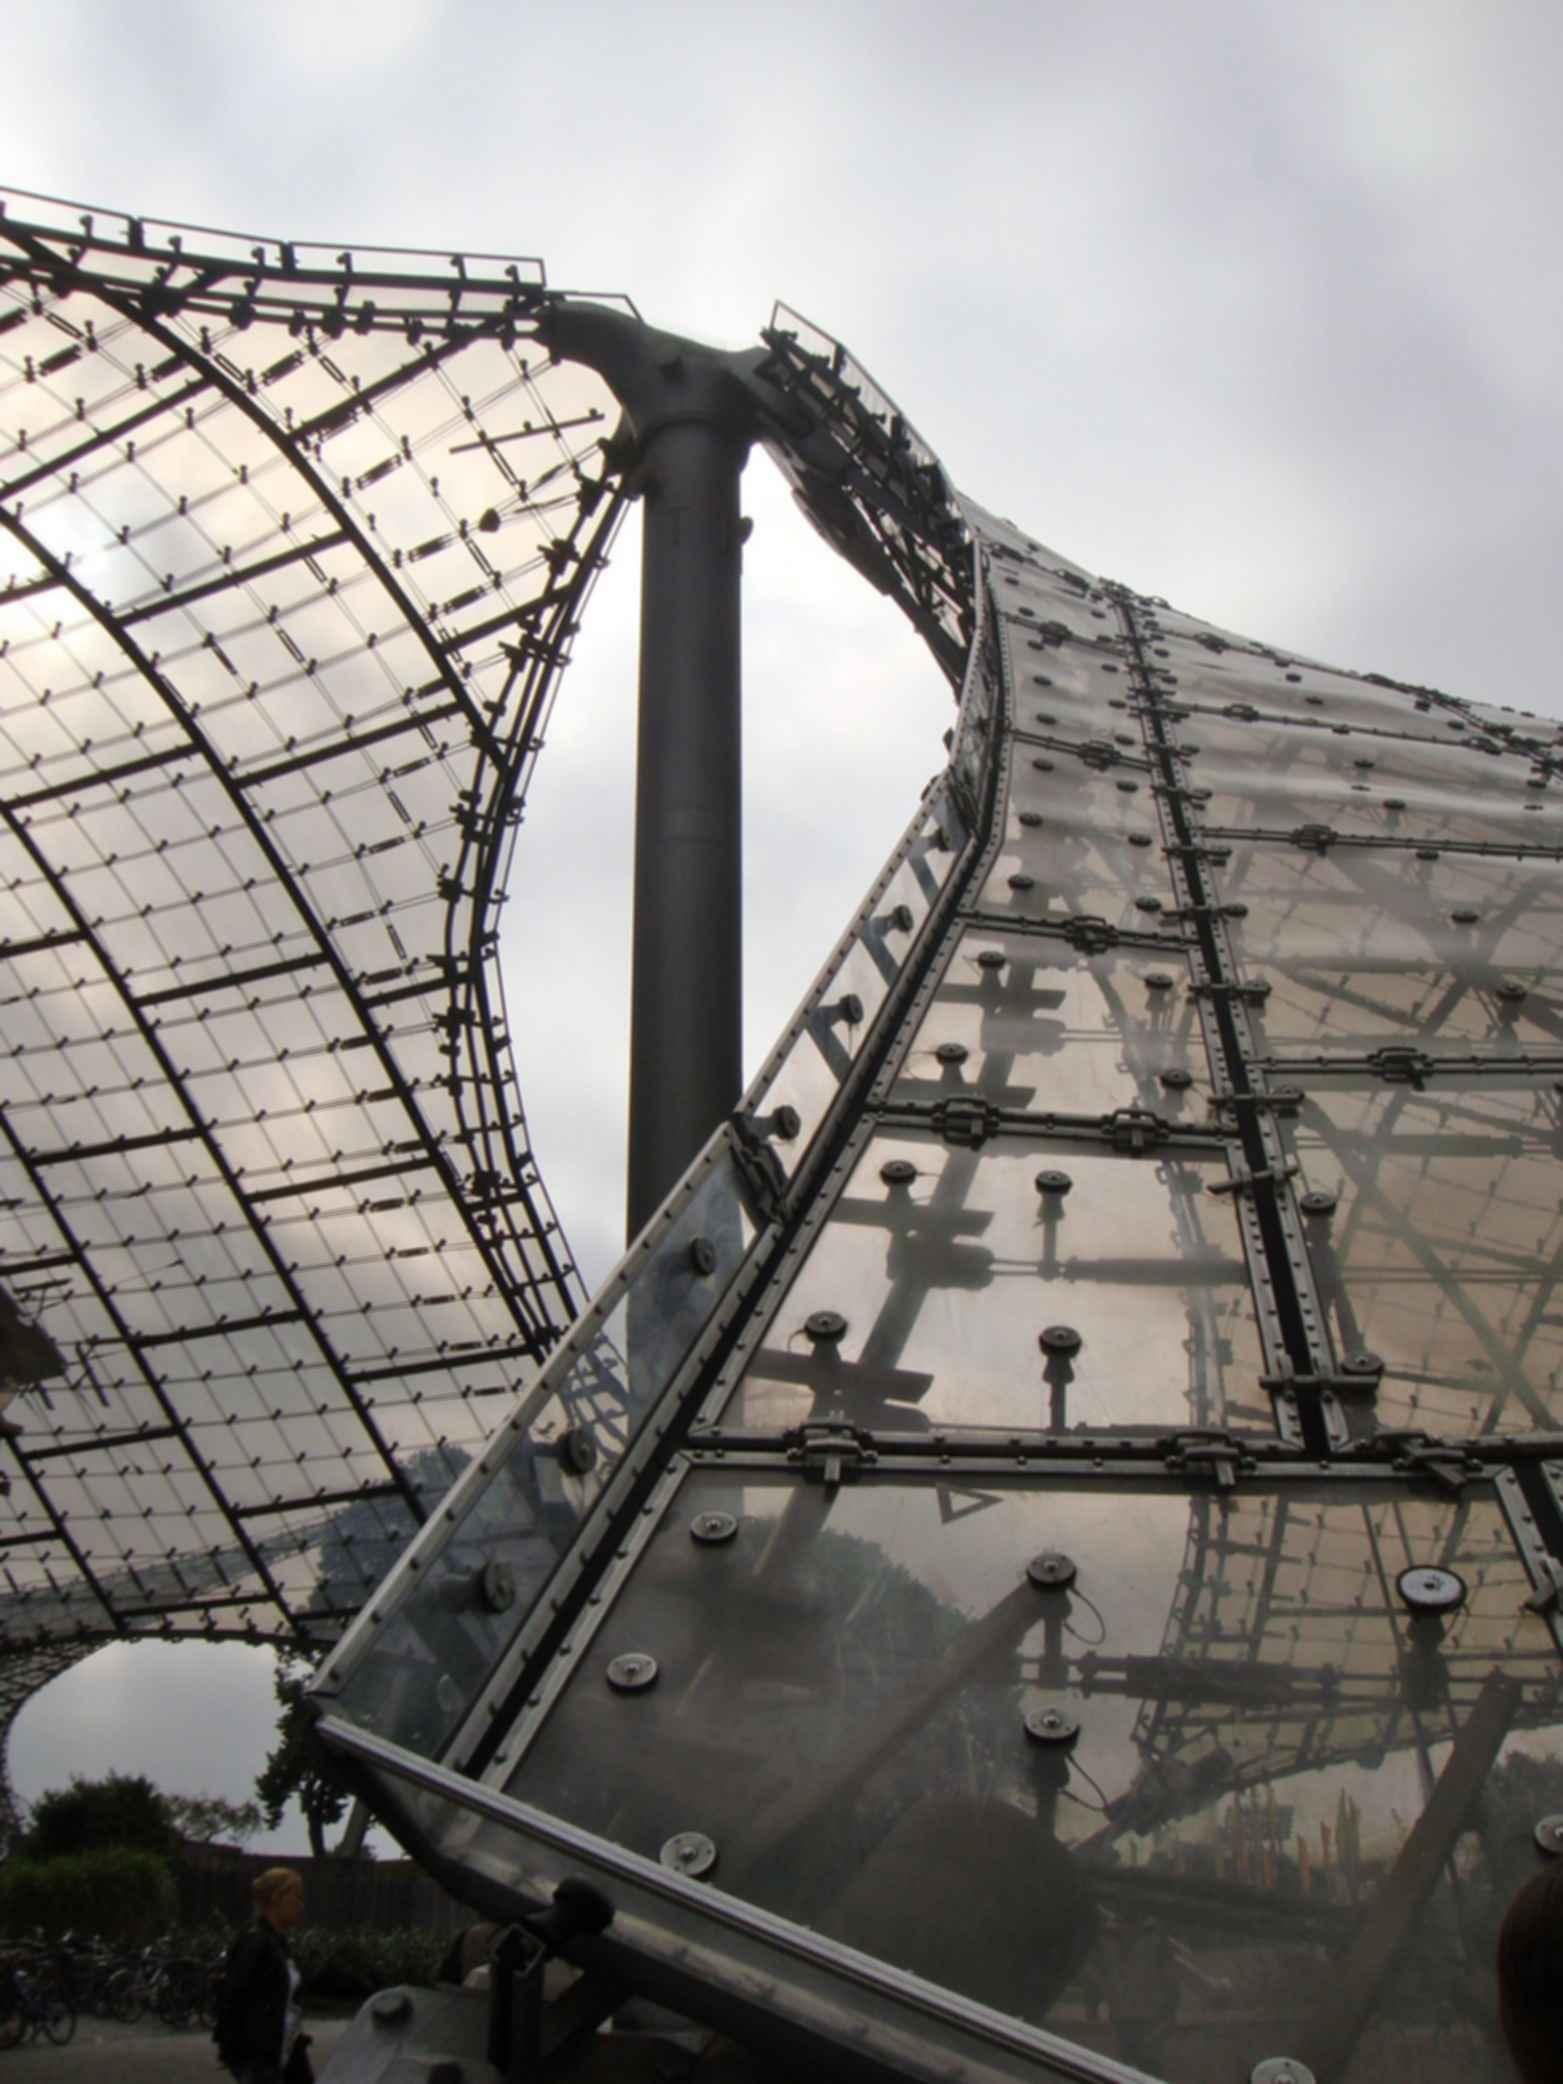 Munich Olympic Stadium - Roofing Details